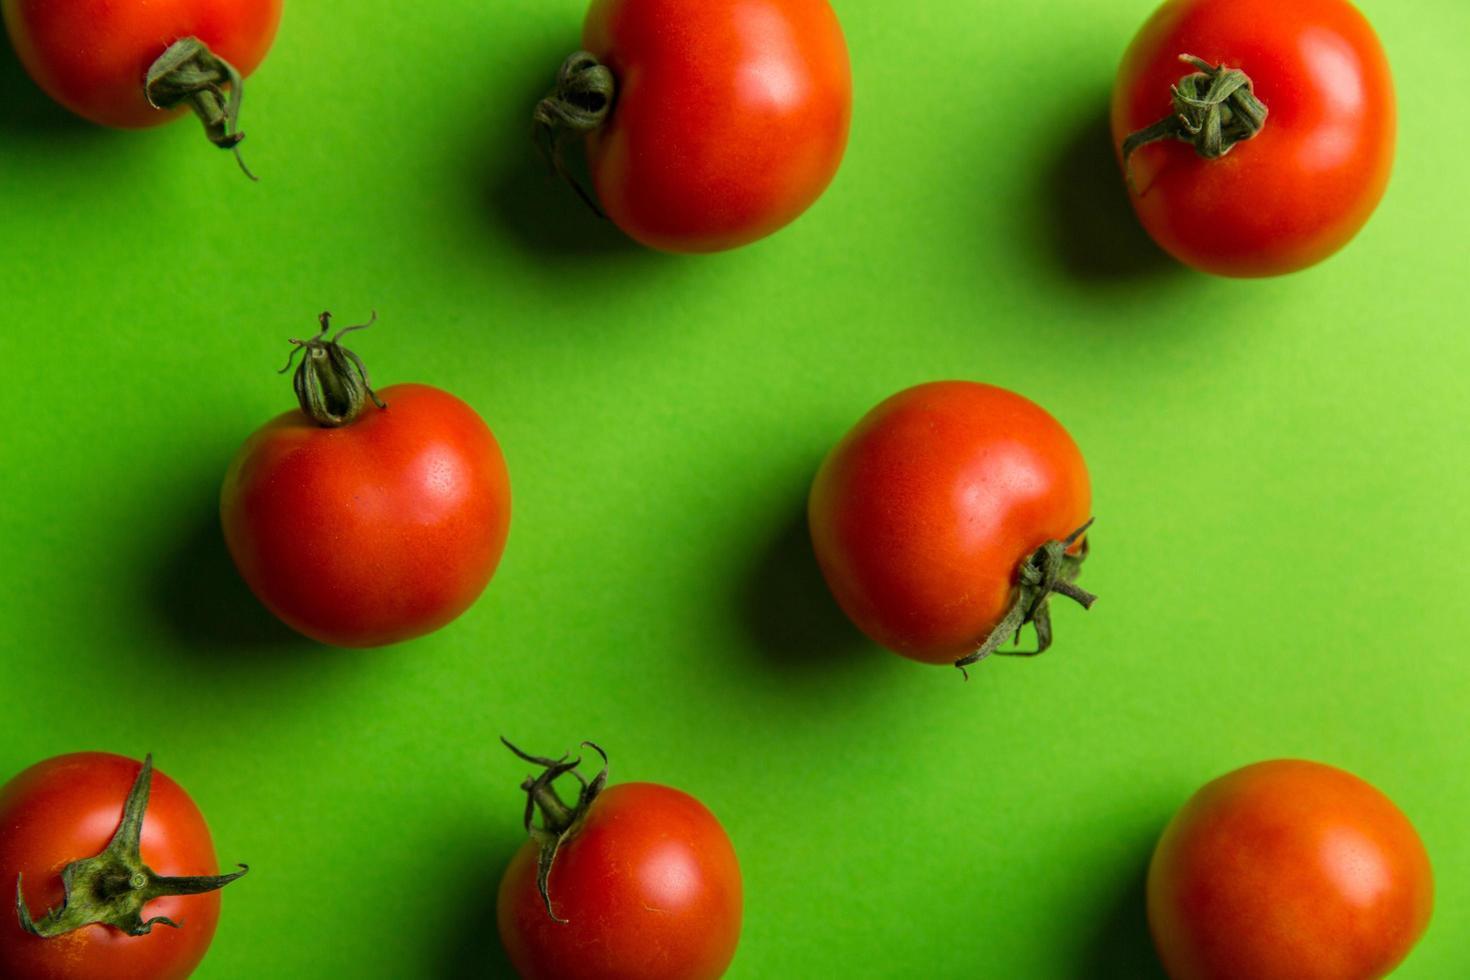 pomodori maturi su sfondo verde foto